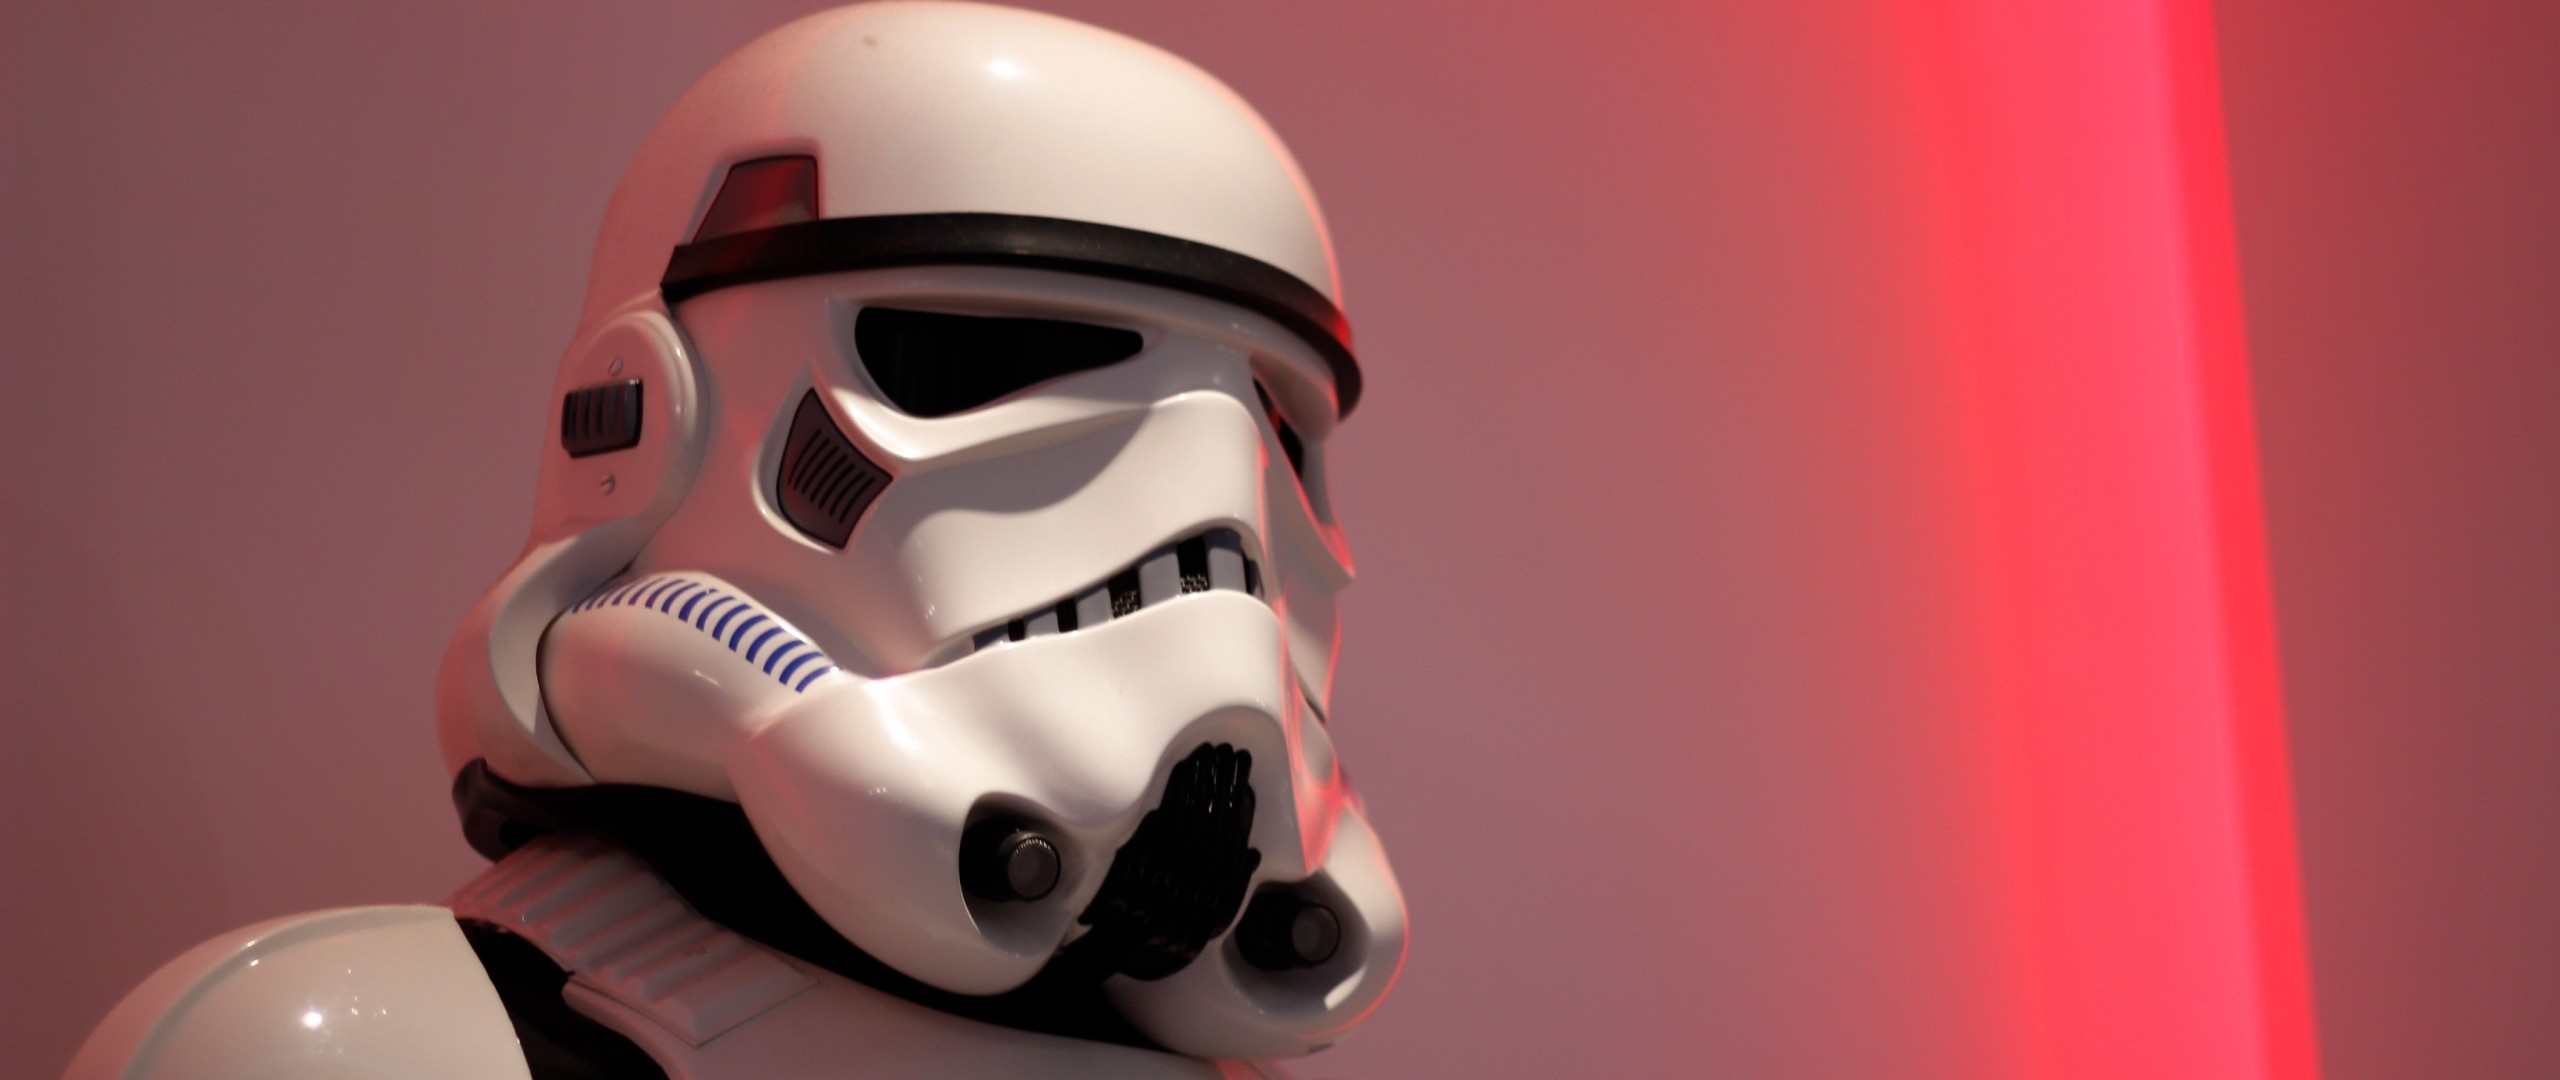 Wallpaper stormtroopers, star wars, lego